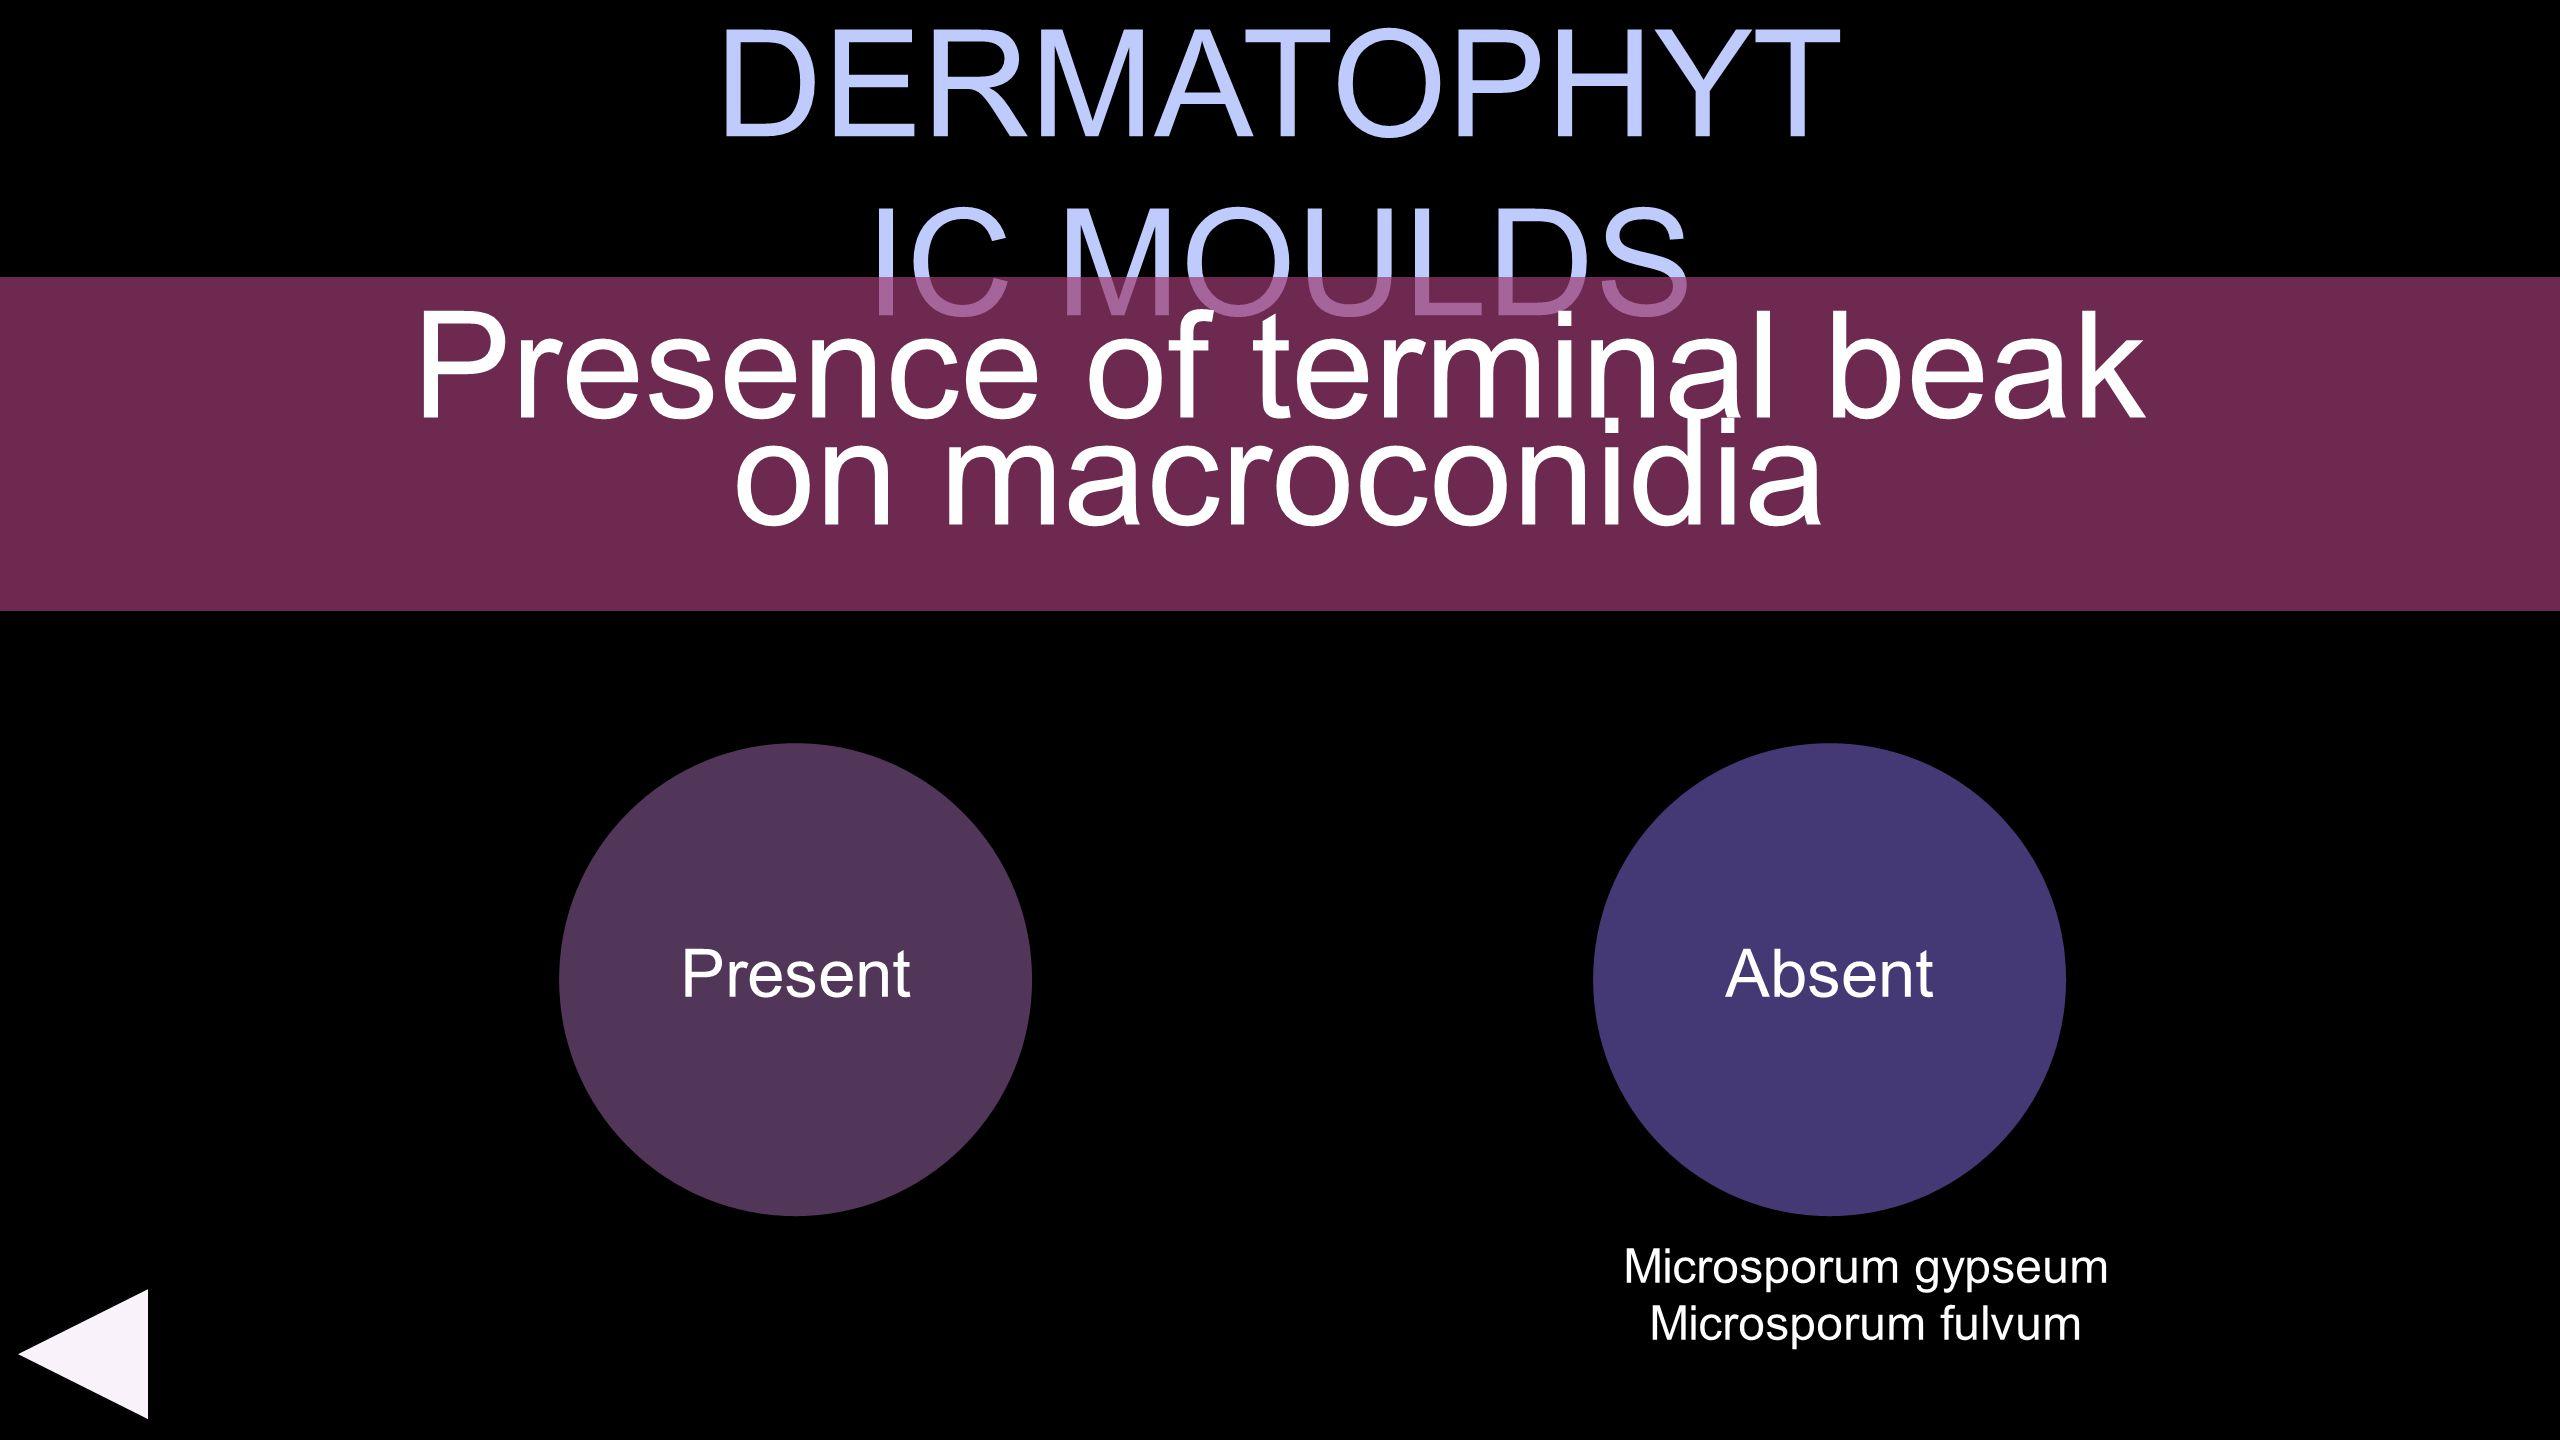 DERMATOPHYT IC MOULDS Present Presence of terminal beak on macroconidia Absent Microsporum gypseum Microsporum fulvum